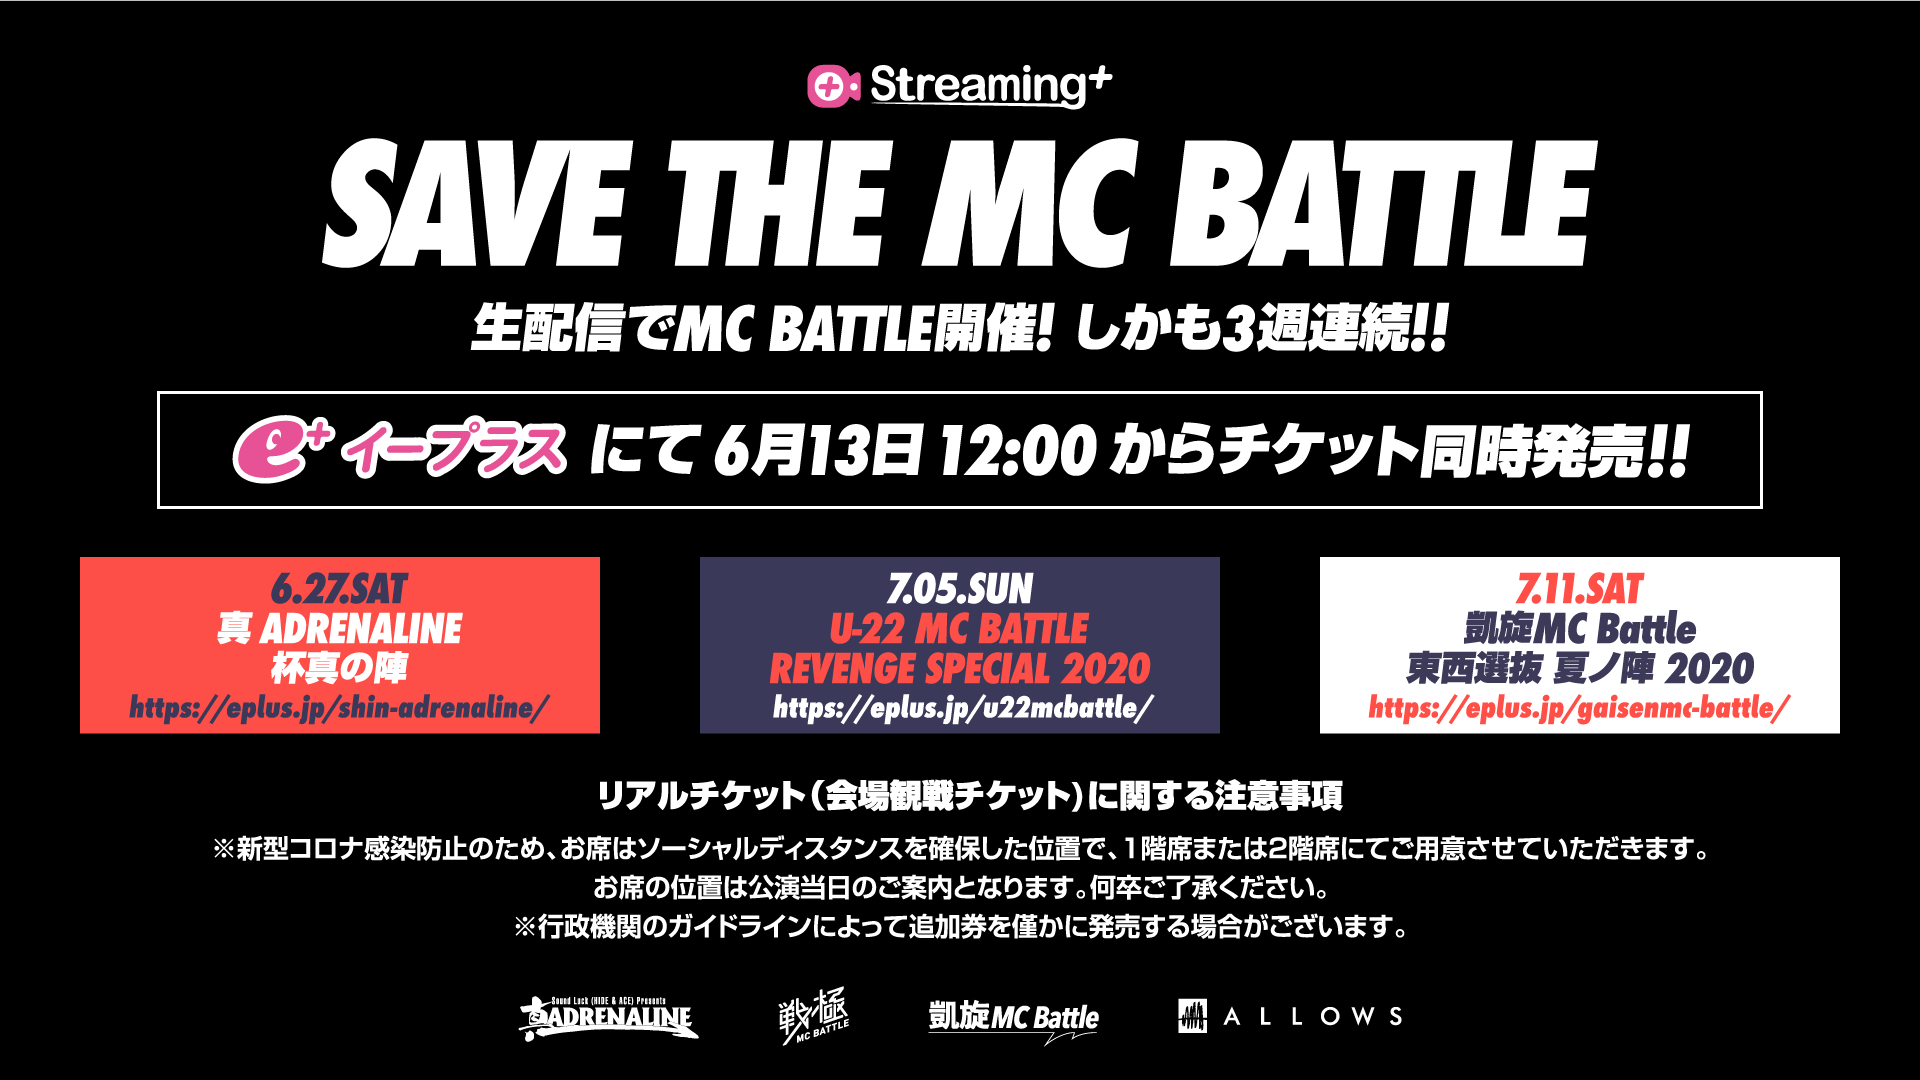 7/5 U-22MCBATTLE REVENGE SPECIAL 2020 出演者発表!チケット販売中!_e0246863_23431920.png